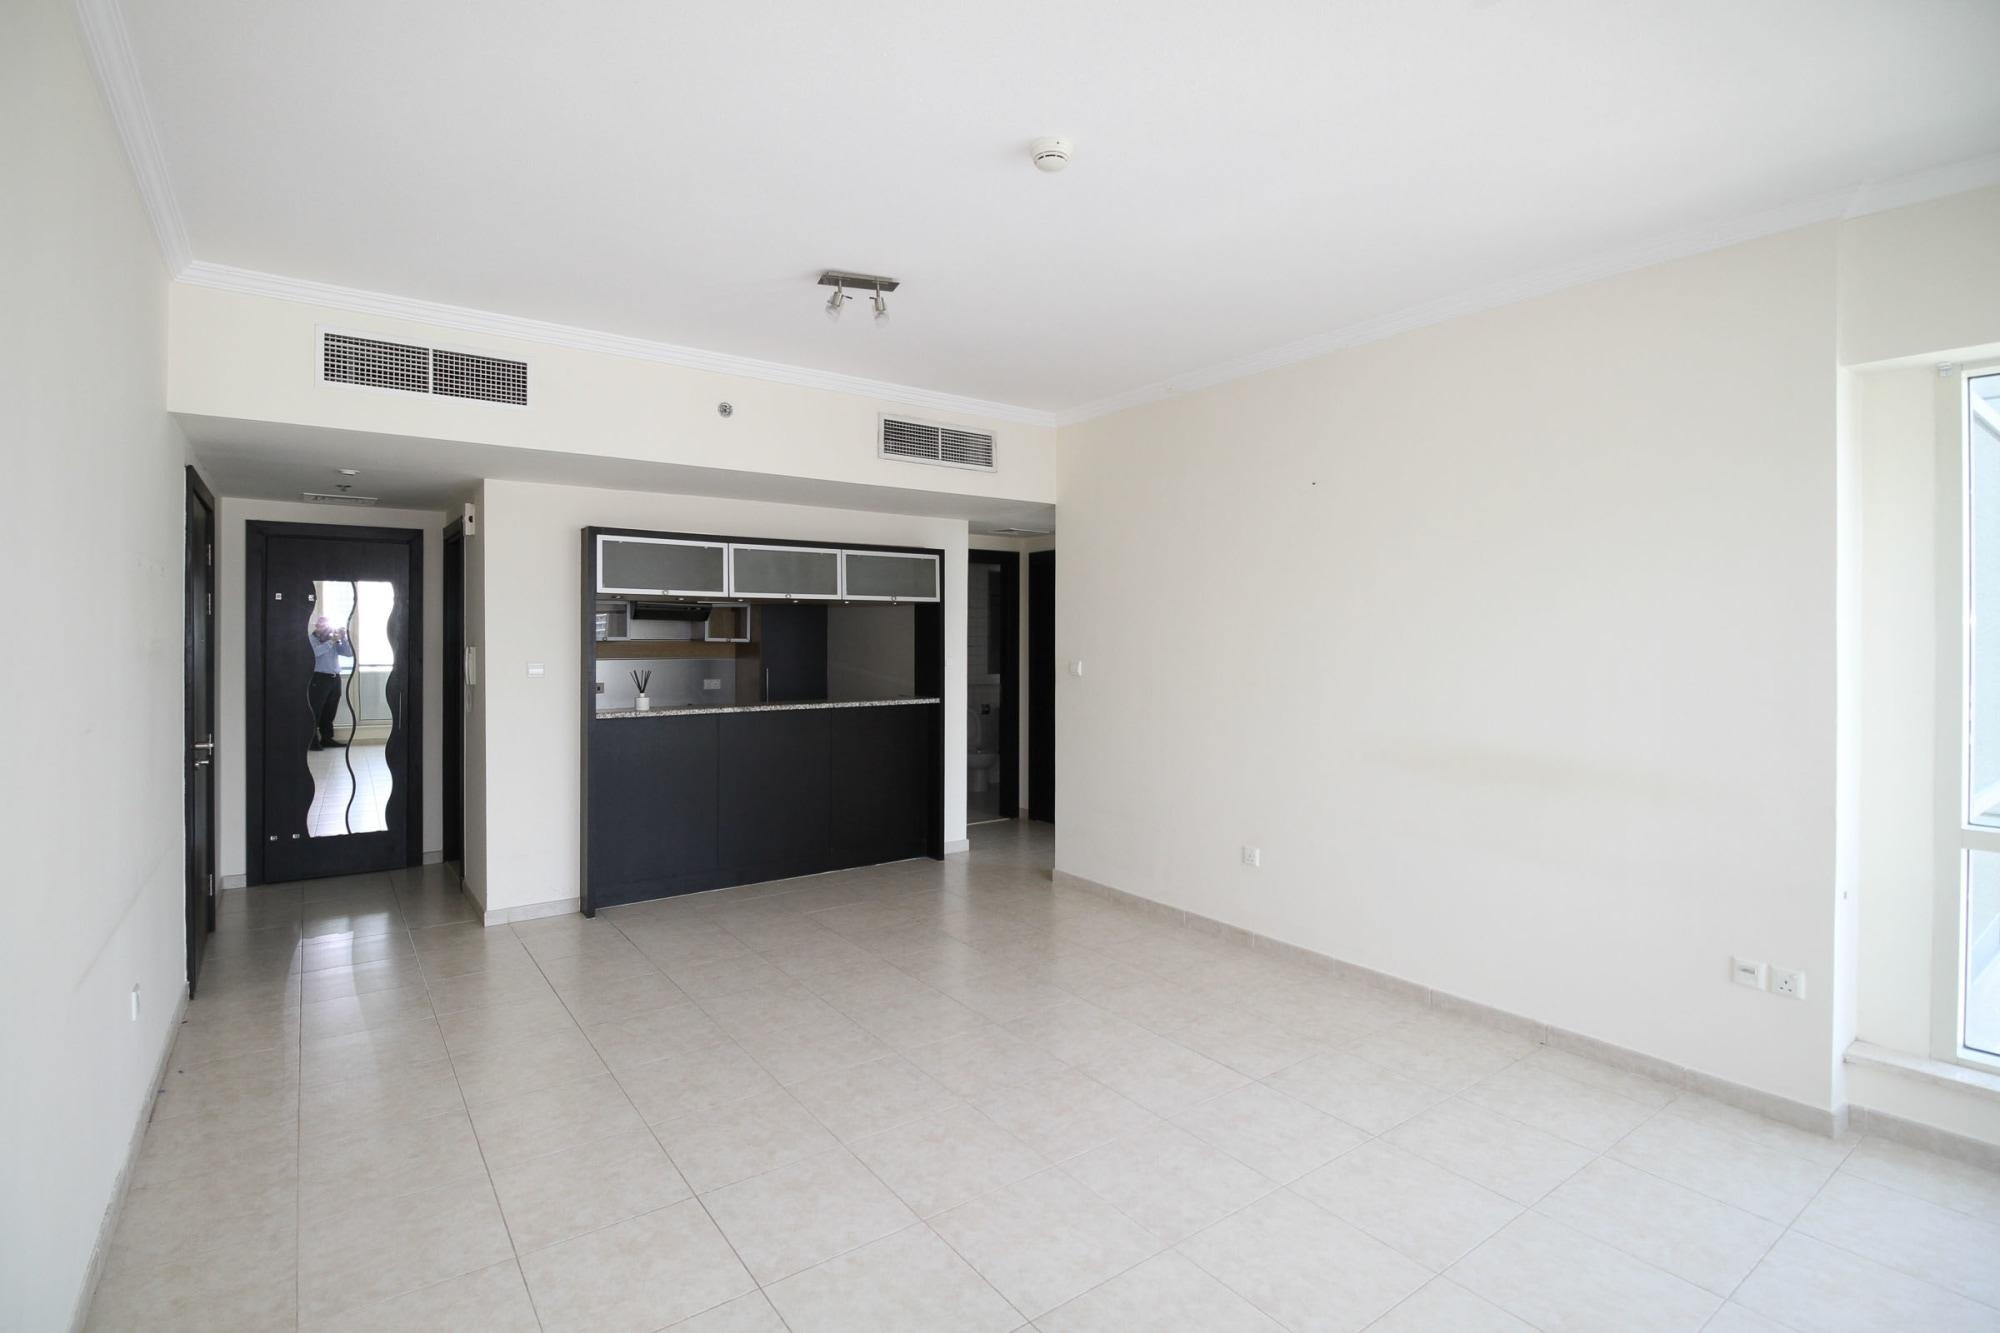 High floor| 1 bedroom | Majara 2 |Available now!